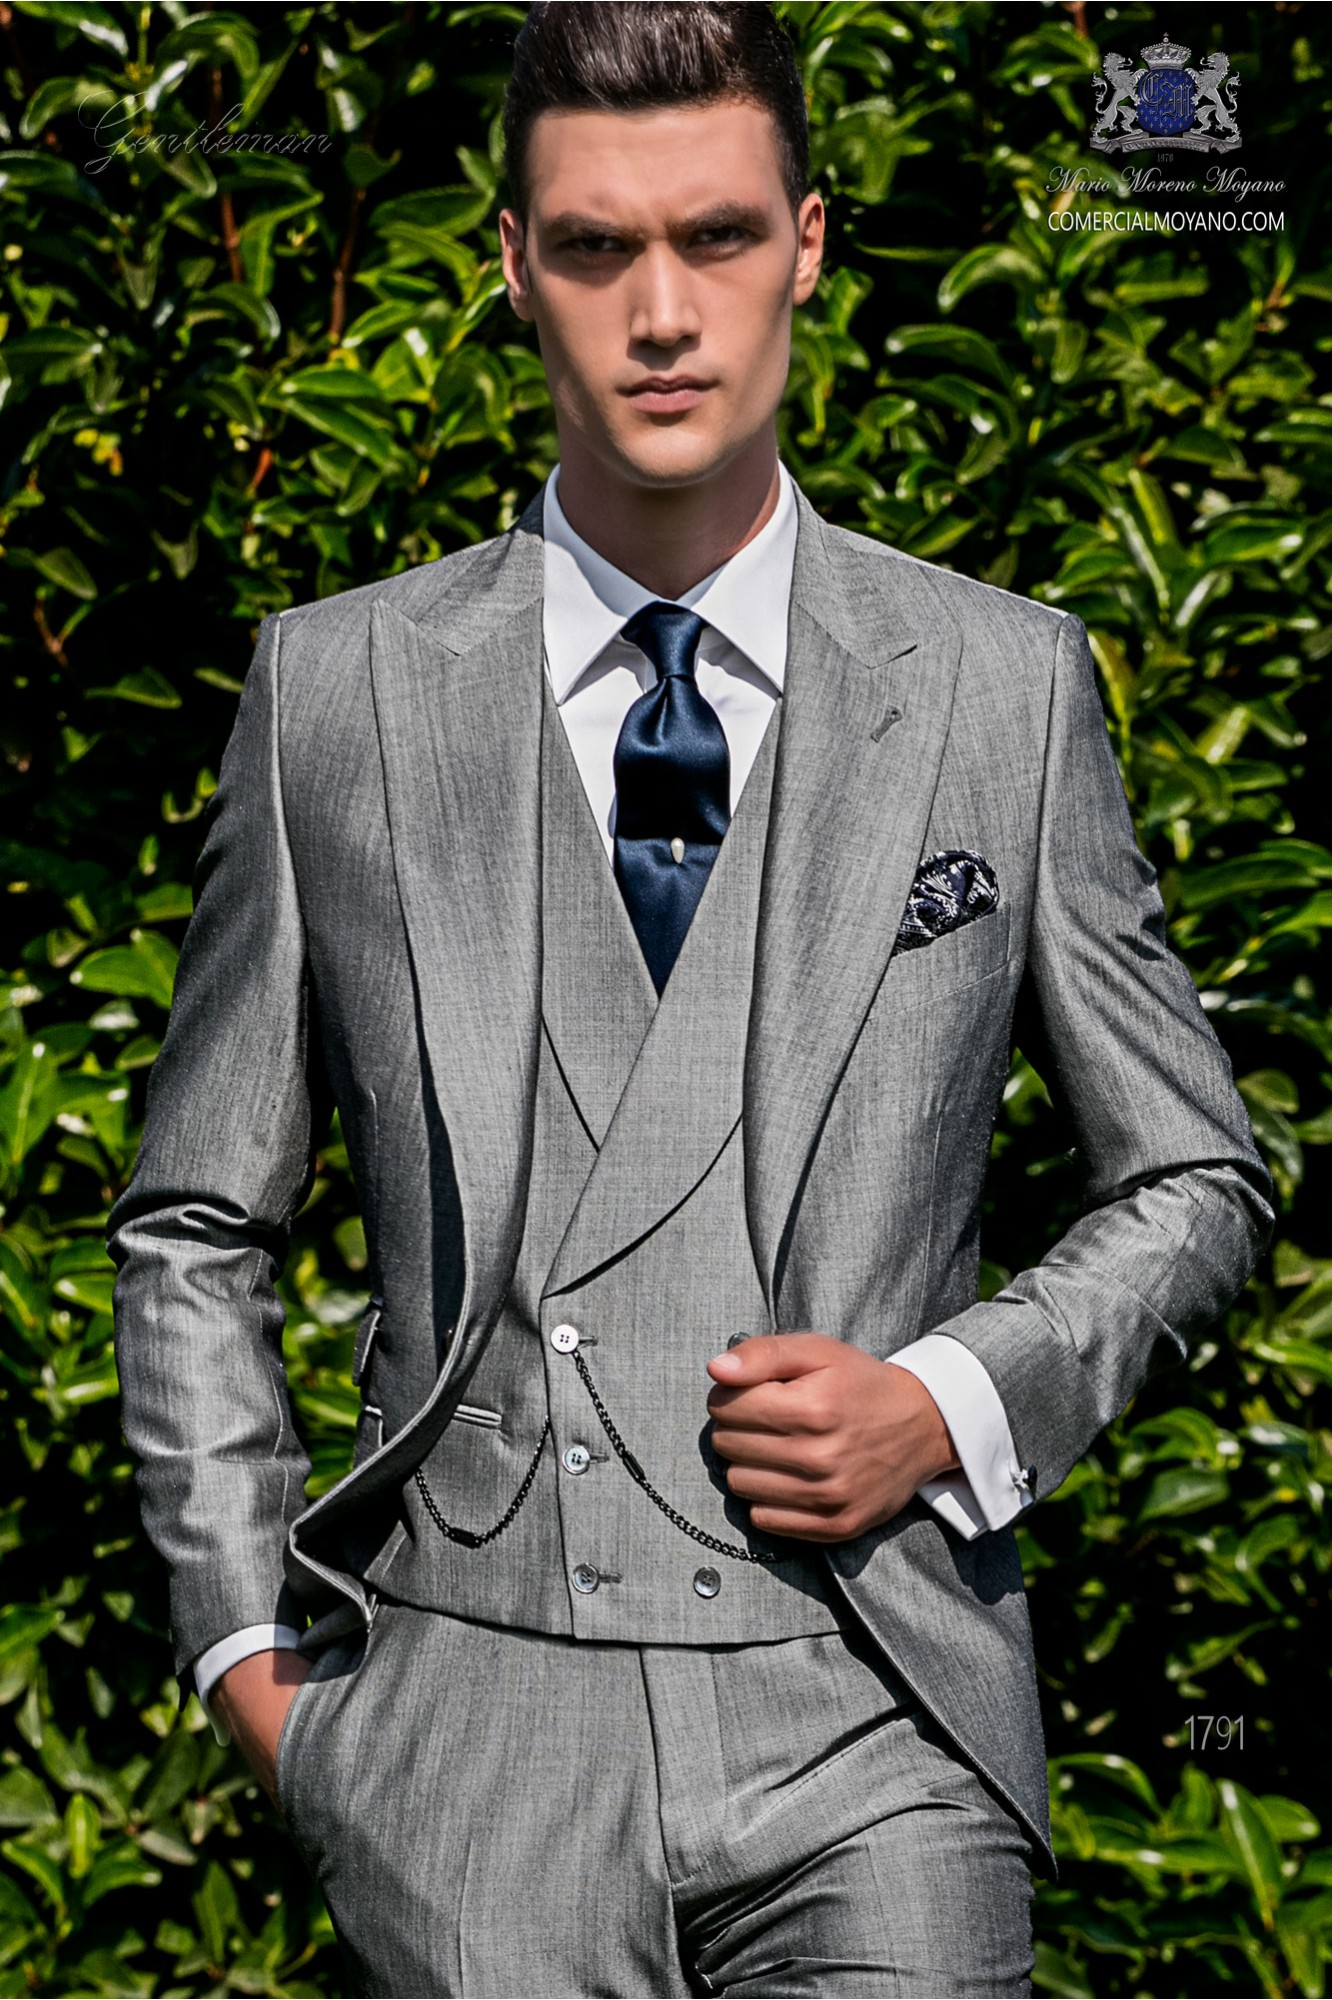 Bespoke light grey suit mohair wool mix alpaca model 1791 Ottavio Nuccio Gala